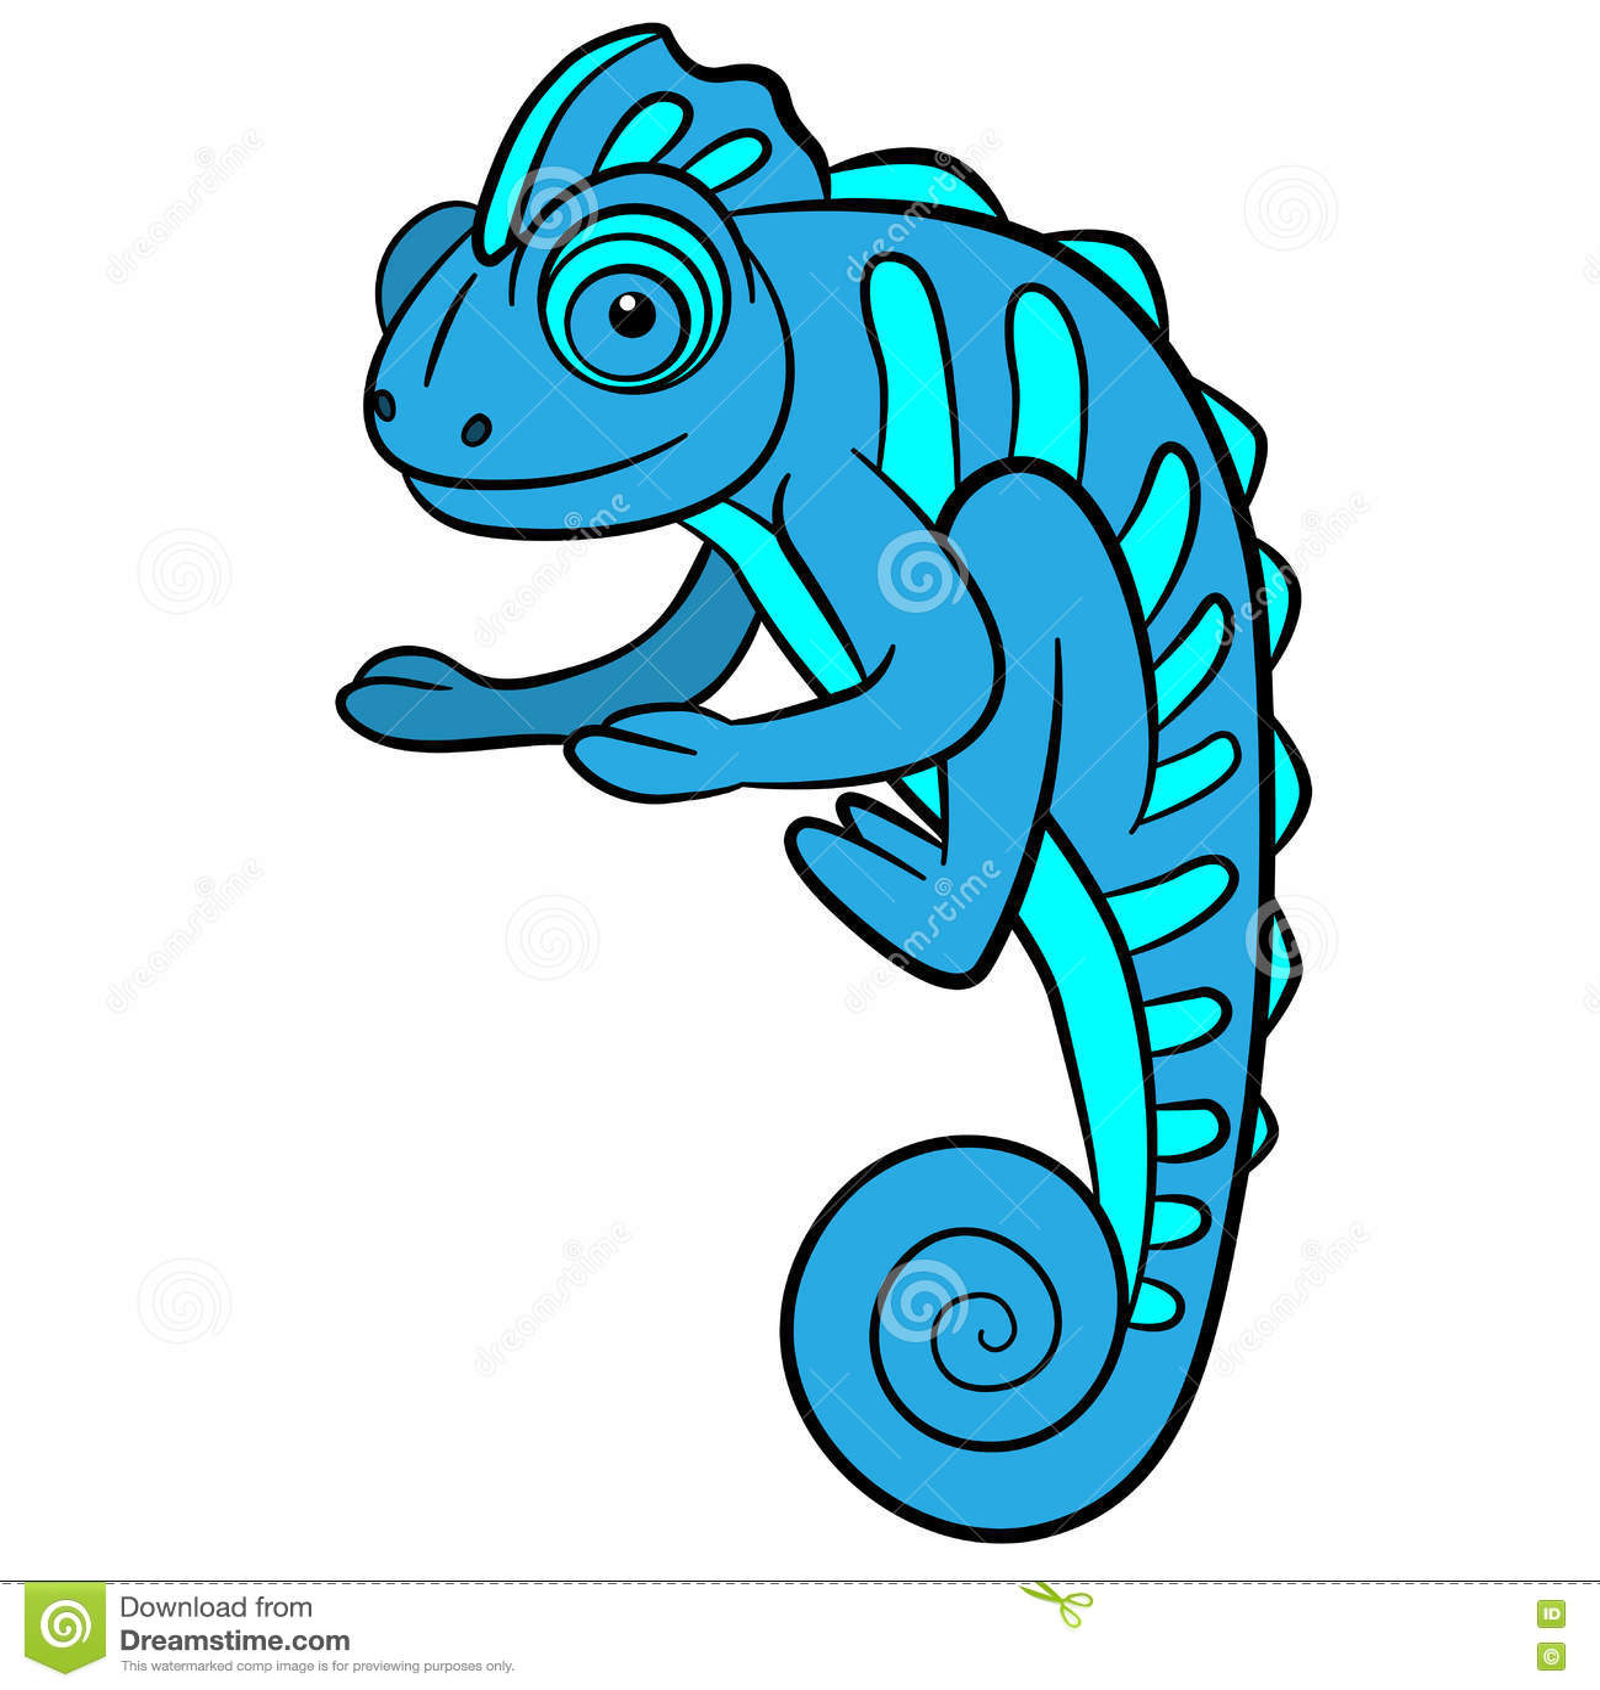 Cartoon Cute Chameleon Vector Illustration